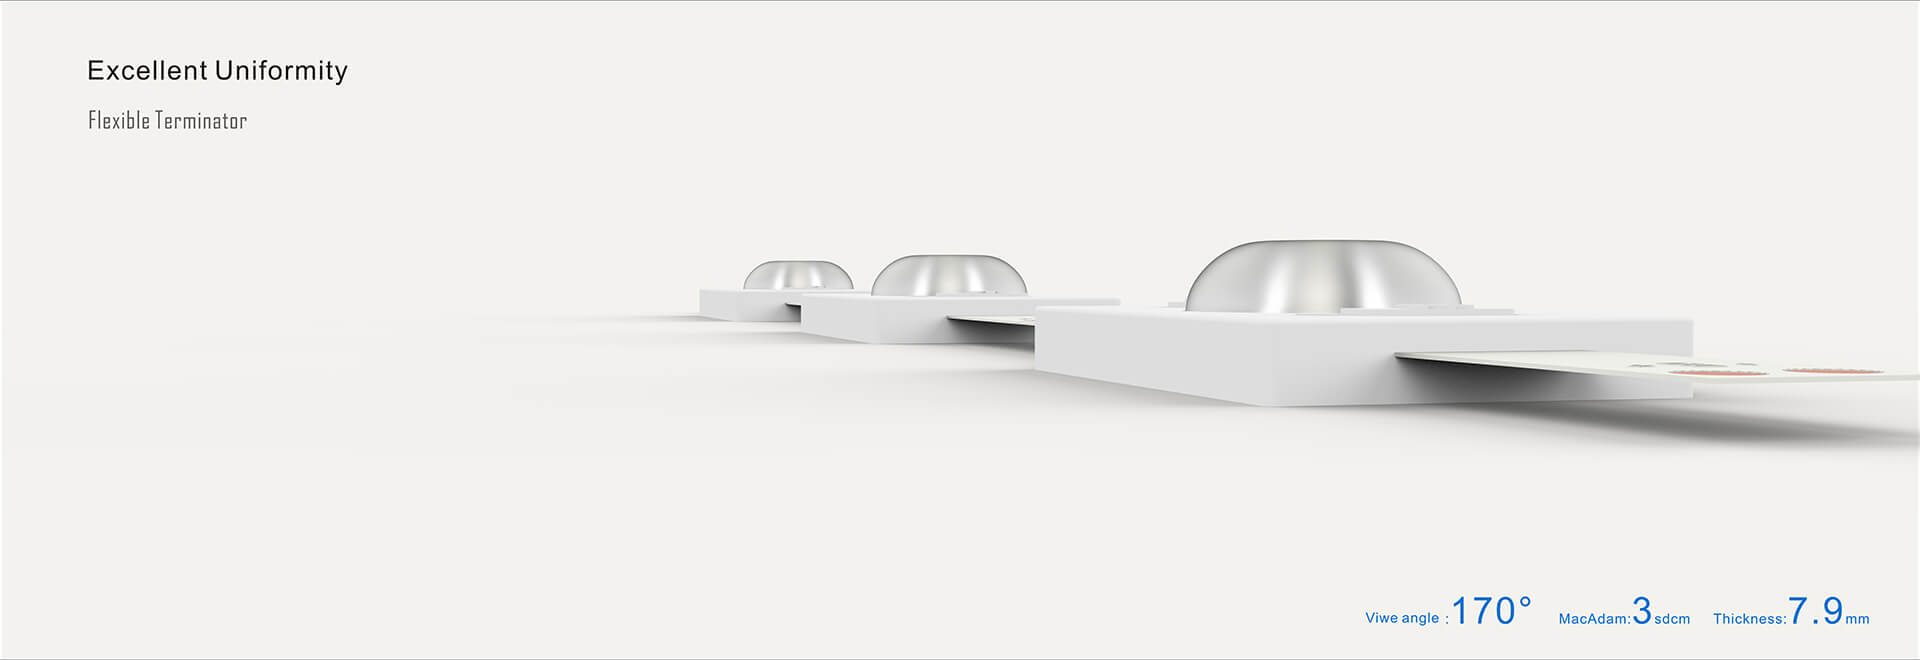 excellent uniformity flexible terminator - Large Scale Luminous Ceiling